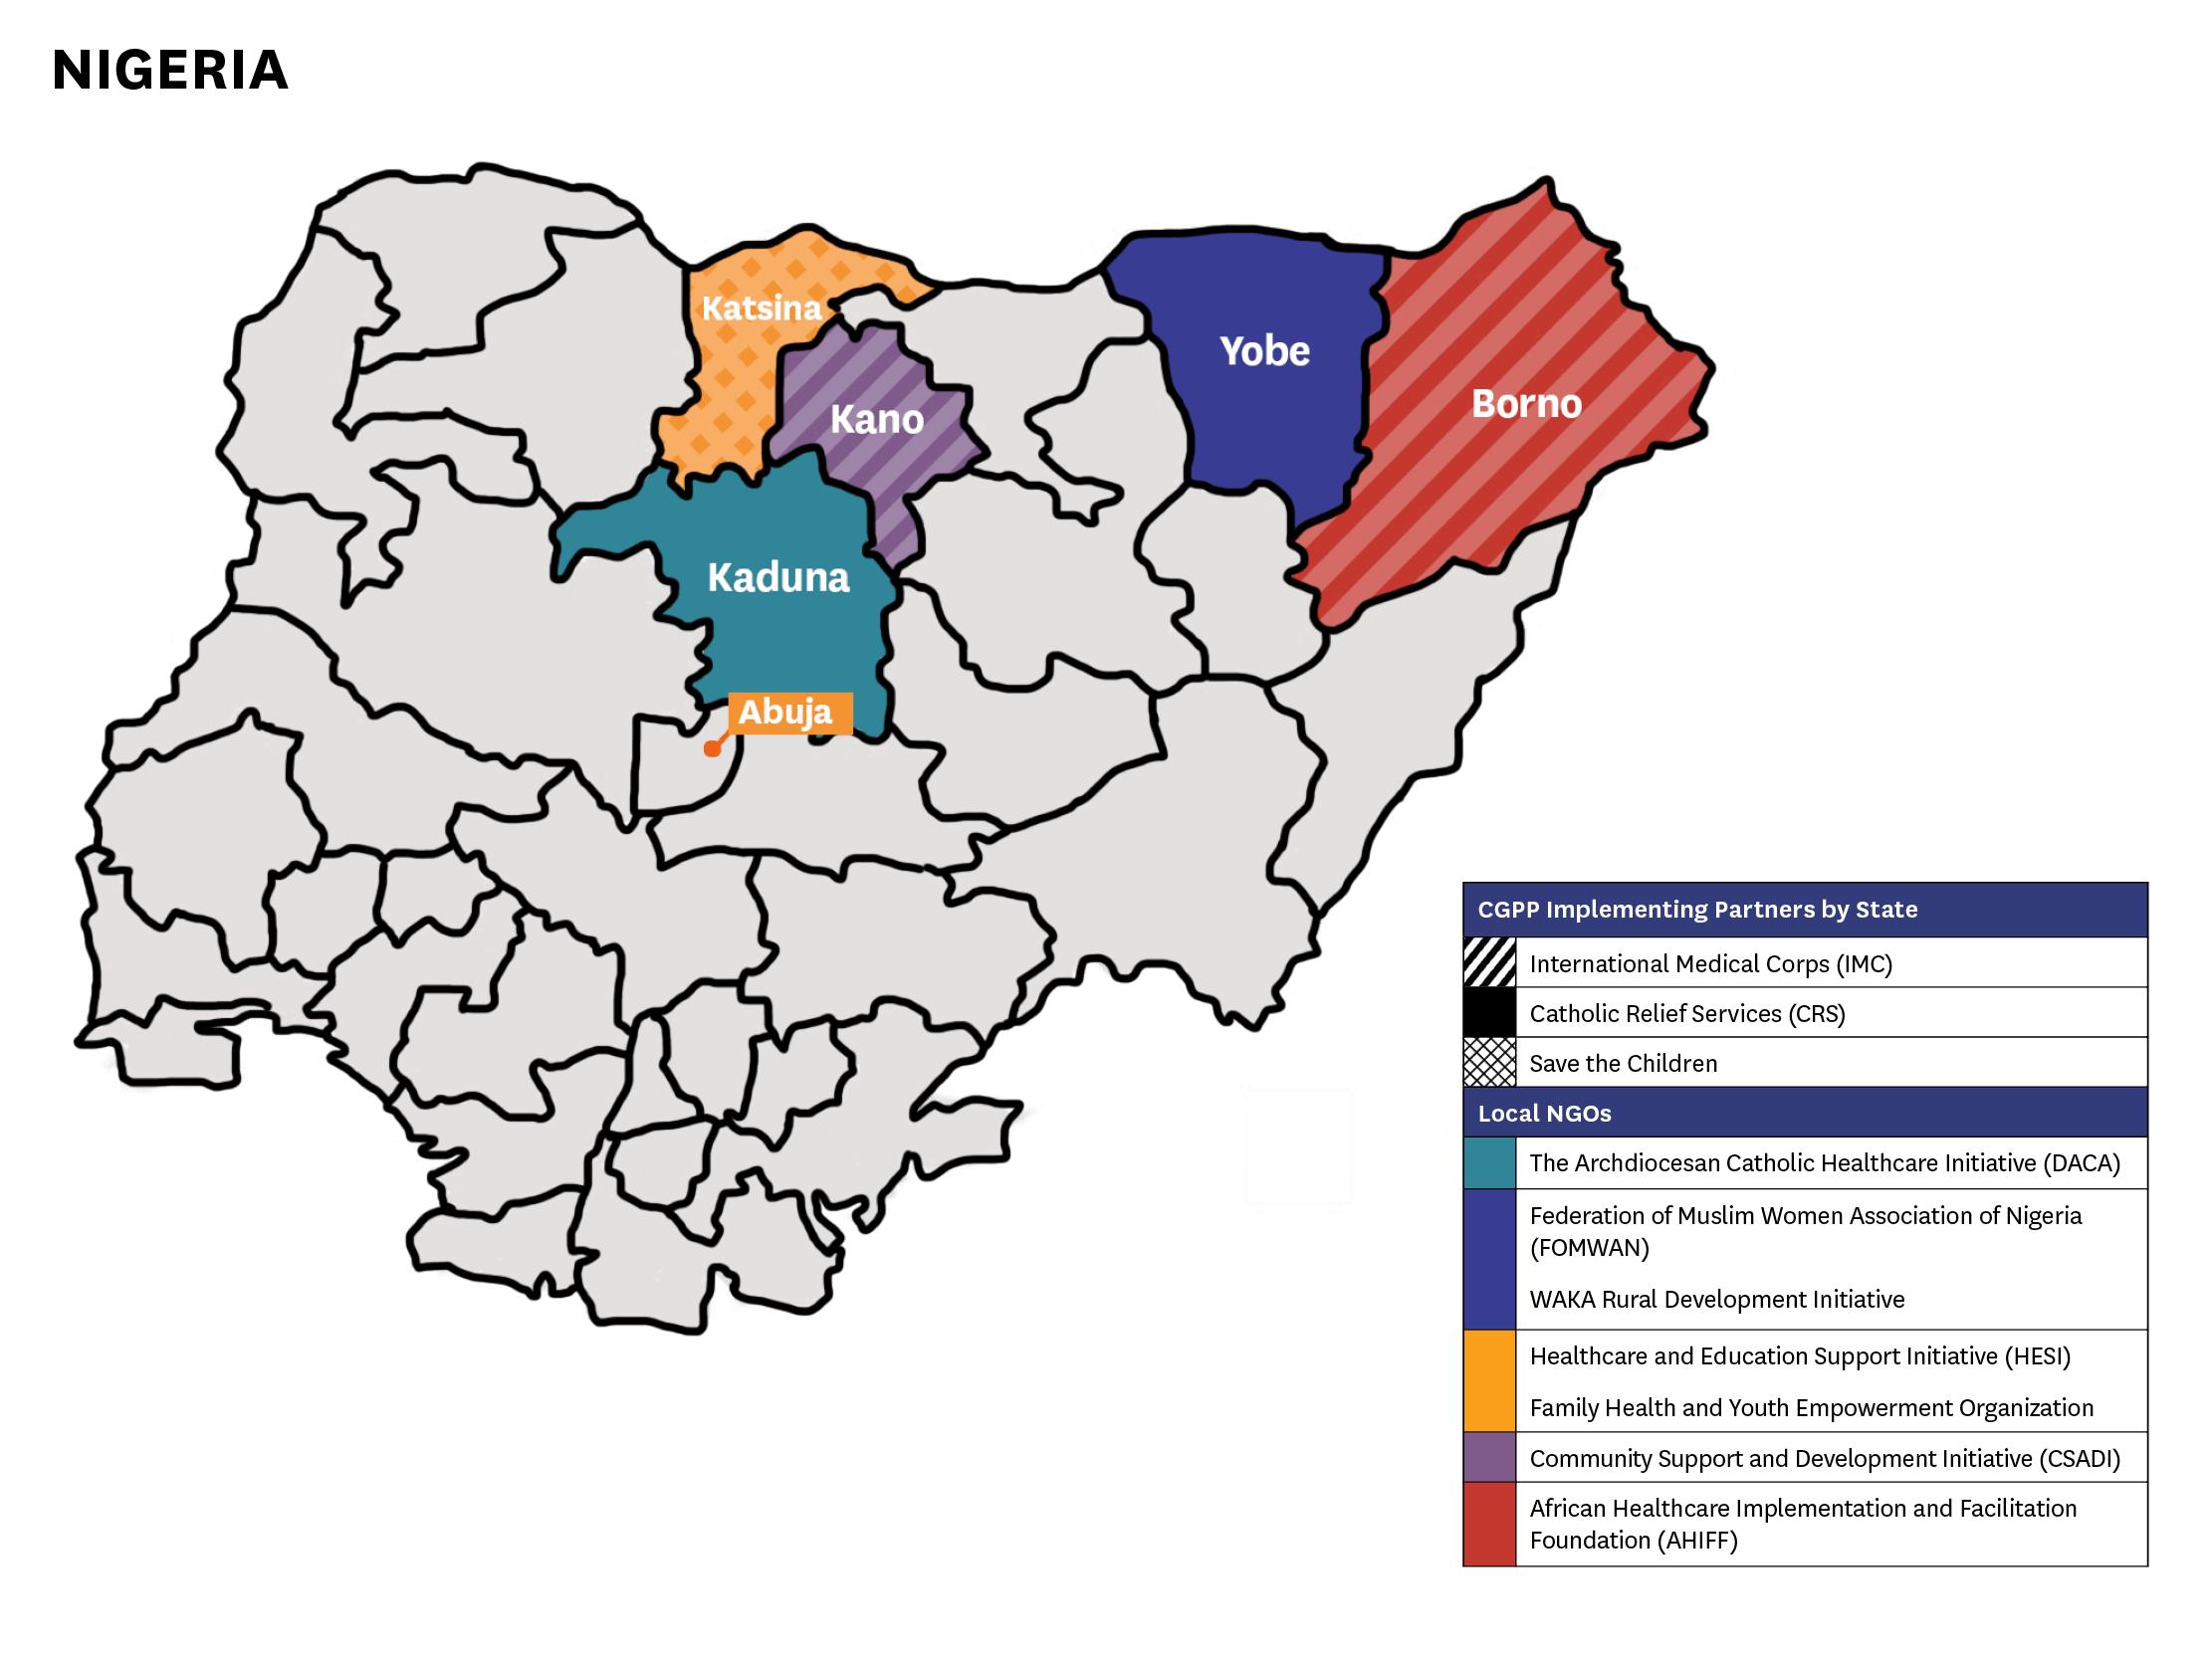 CGPP 2019_Nigeria map